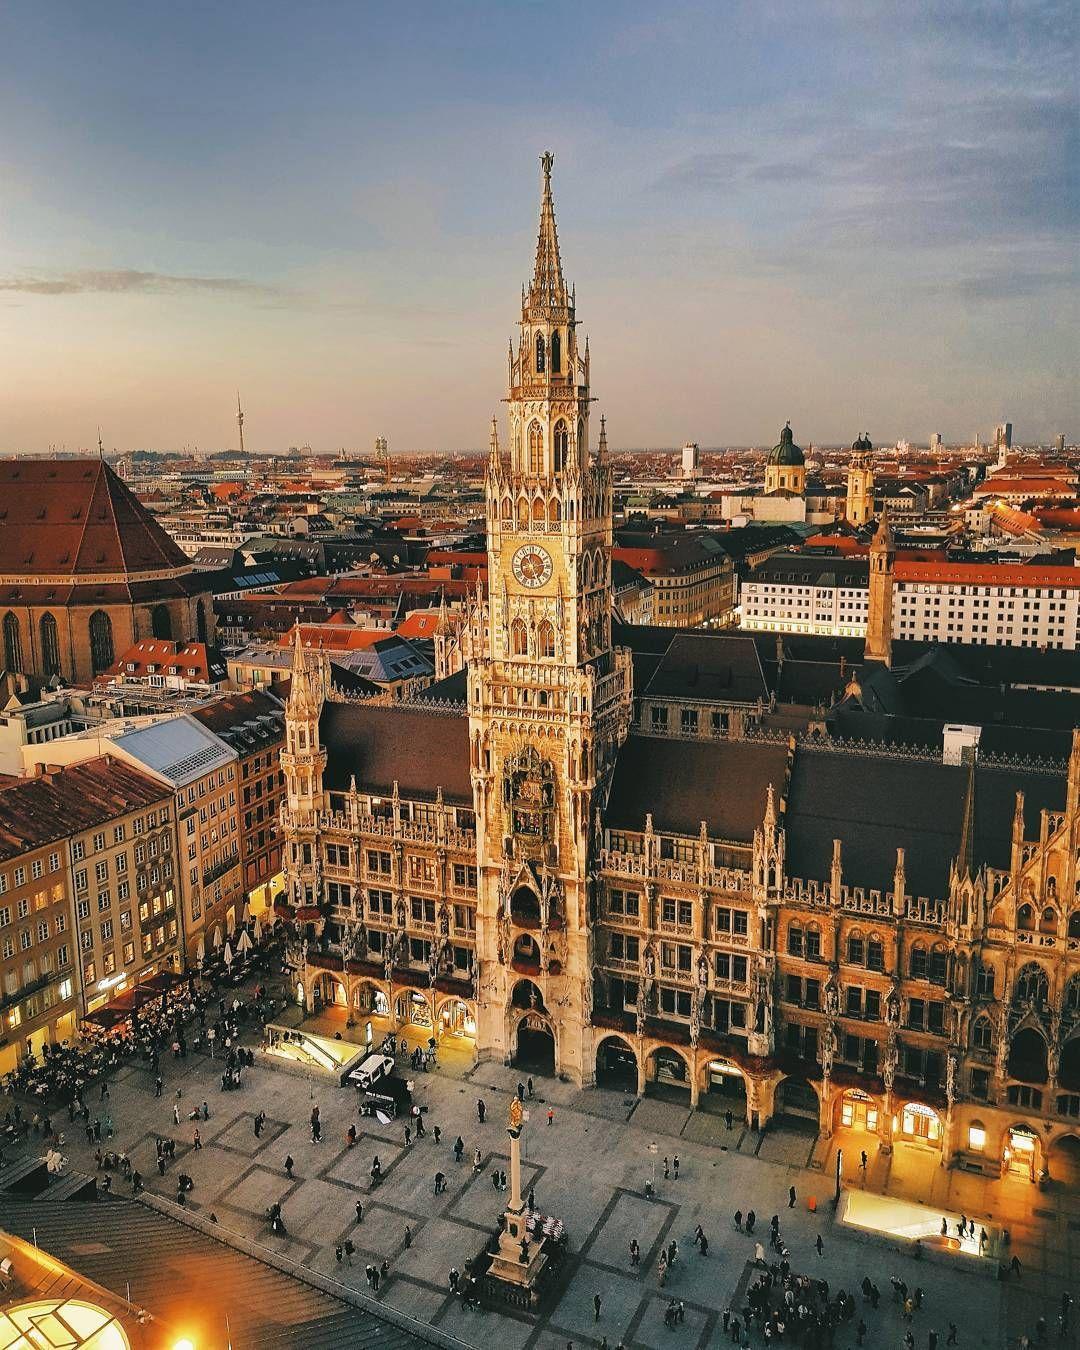 Sunset At Marienplatz English Mary S Square In Munich Photography By Elham Hoxhalli Via Instagram Elhamhoxhalli Germany Deutschland Bavaria Bay